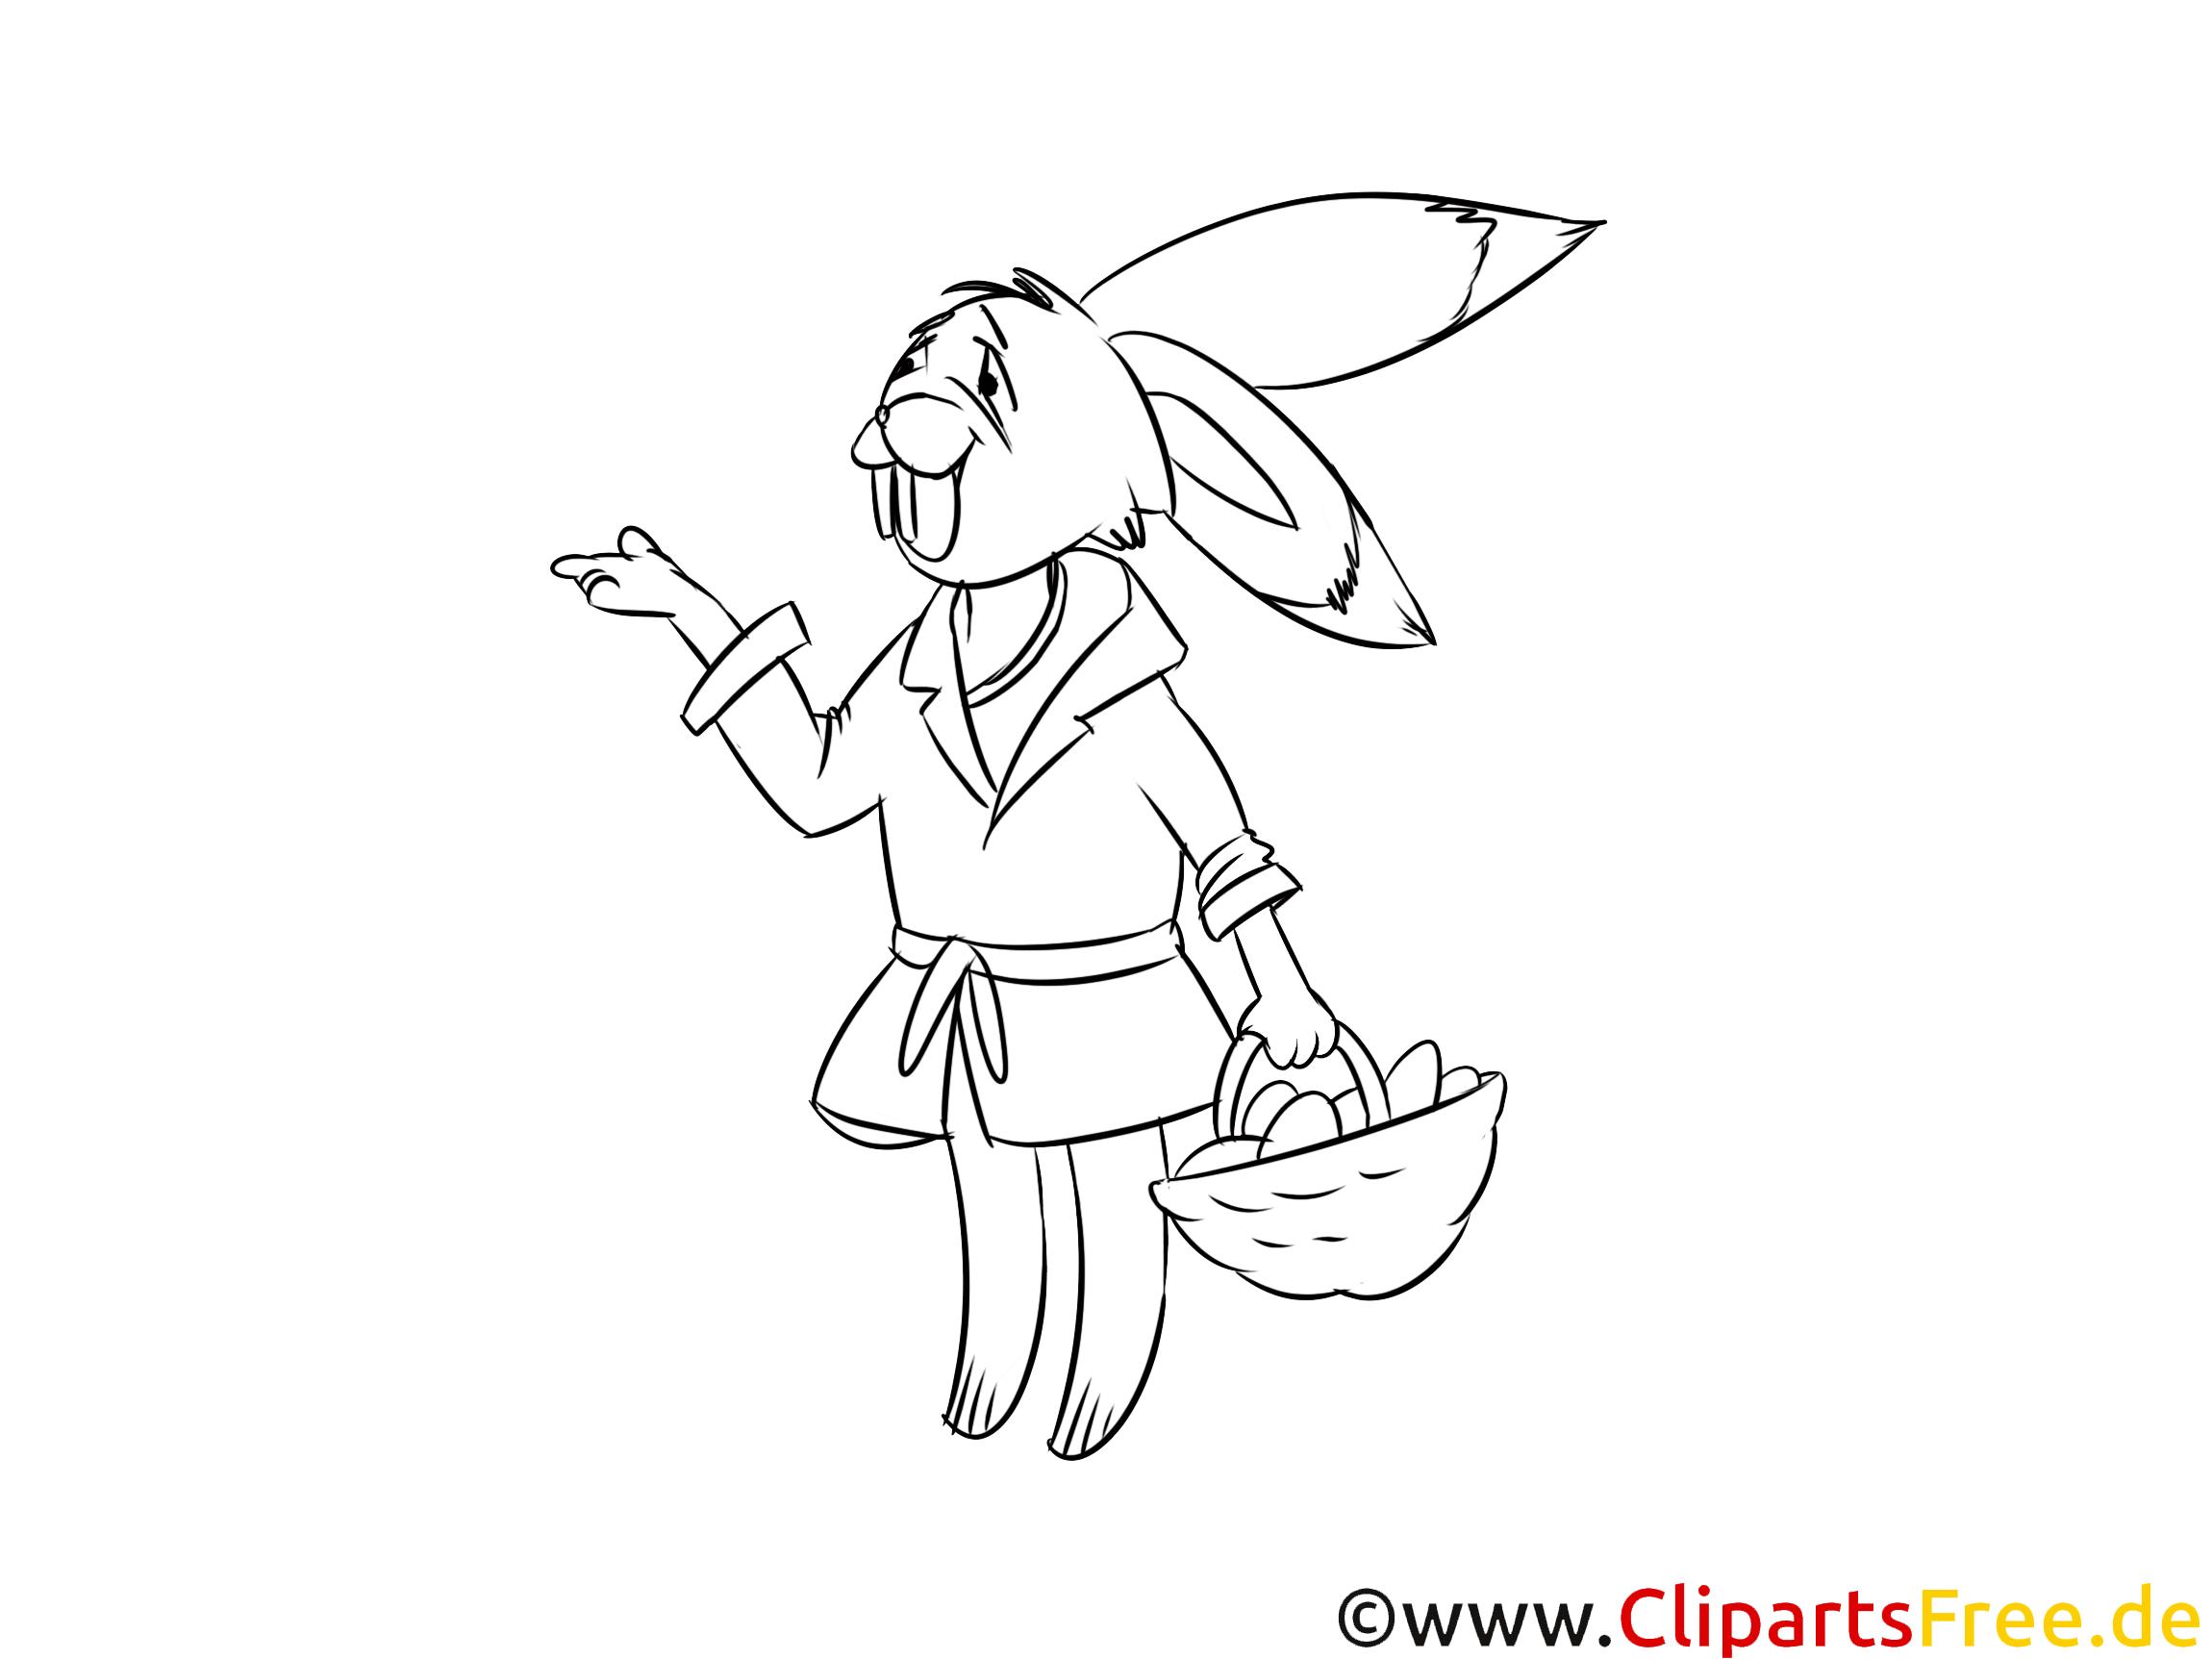 Osterhase, Kaninchen, Hase Ausmalbild